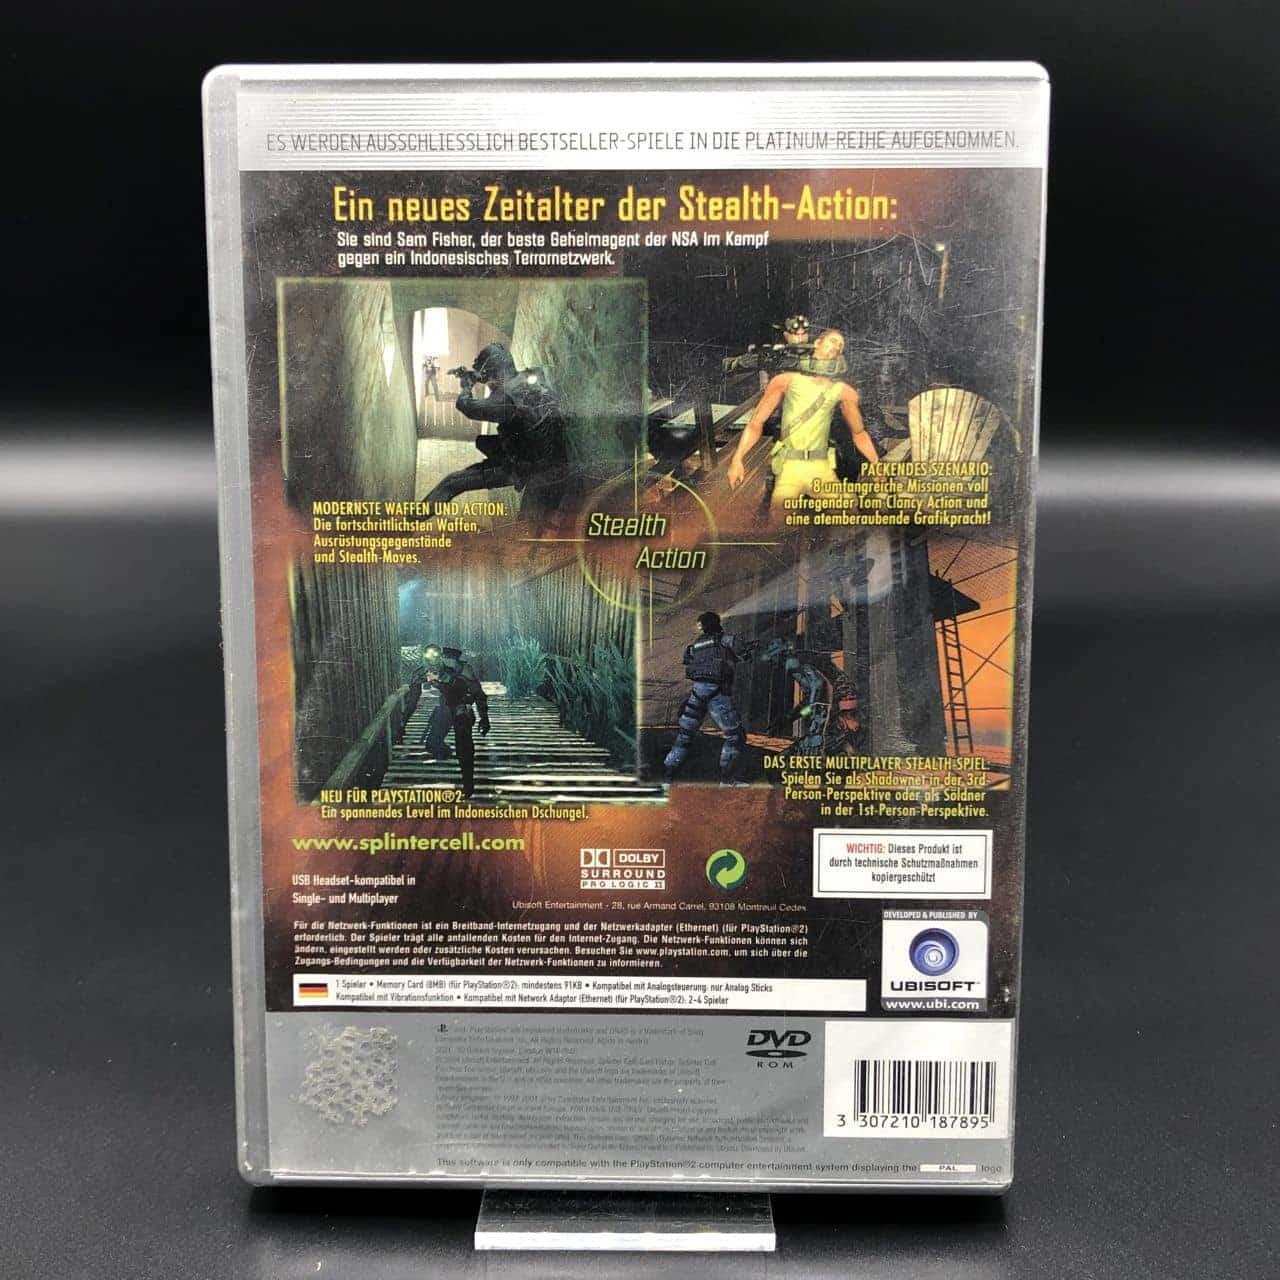 PS2 Tom Clancy's Splinter Cell: Pandora Tomorrow (Platinum) (Komplett) (Gebrauchsspuren)